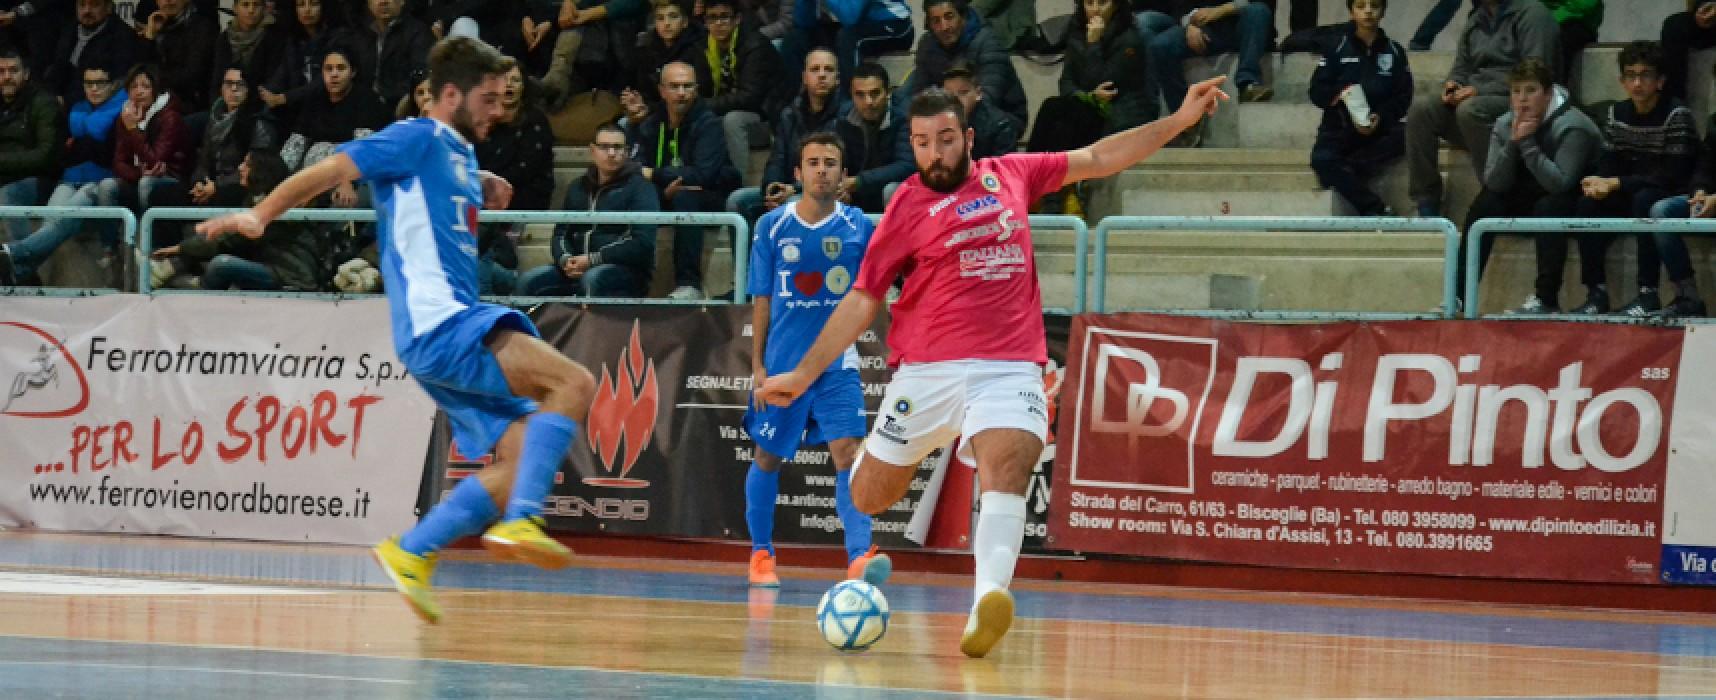 Futsal Bisceglie-Azzurri Conversano 7-3/VIDEO HIGHTLIGHTS